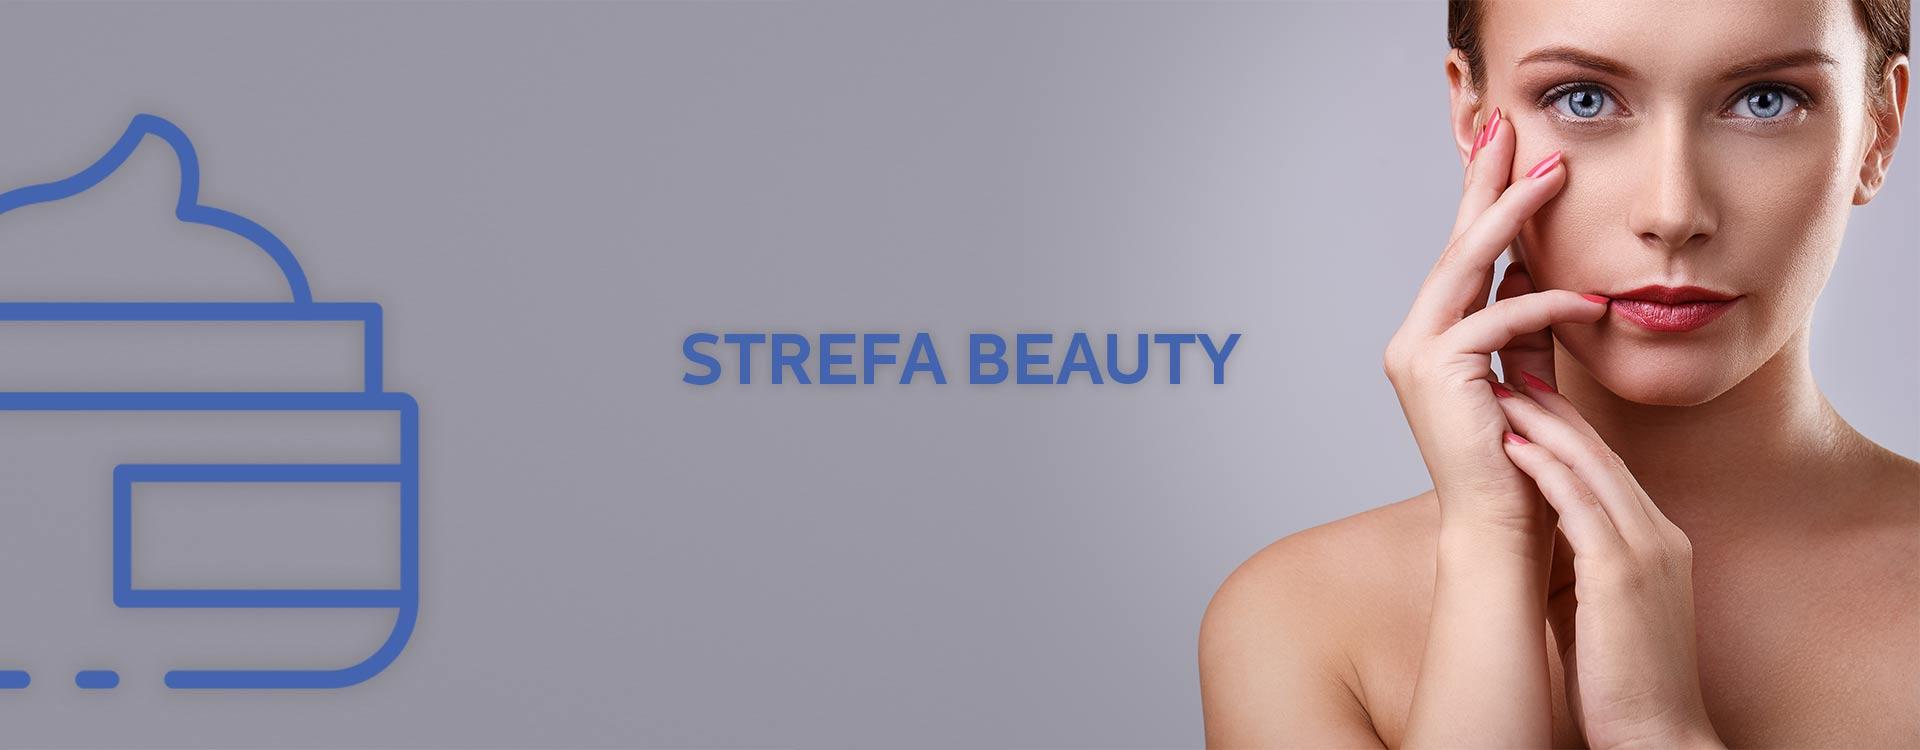 strefa_beauty